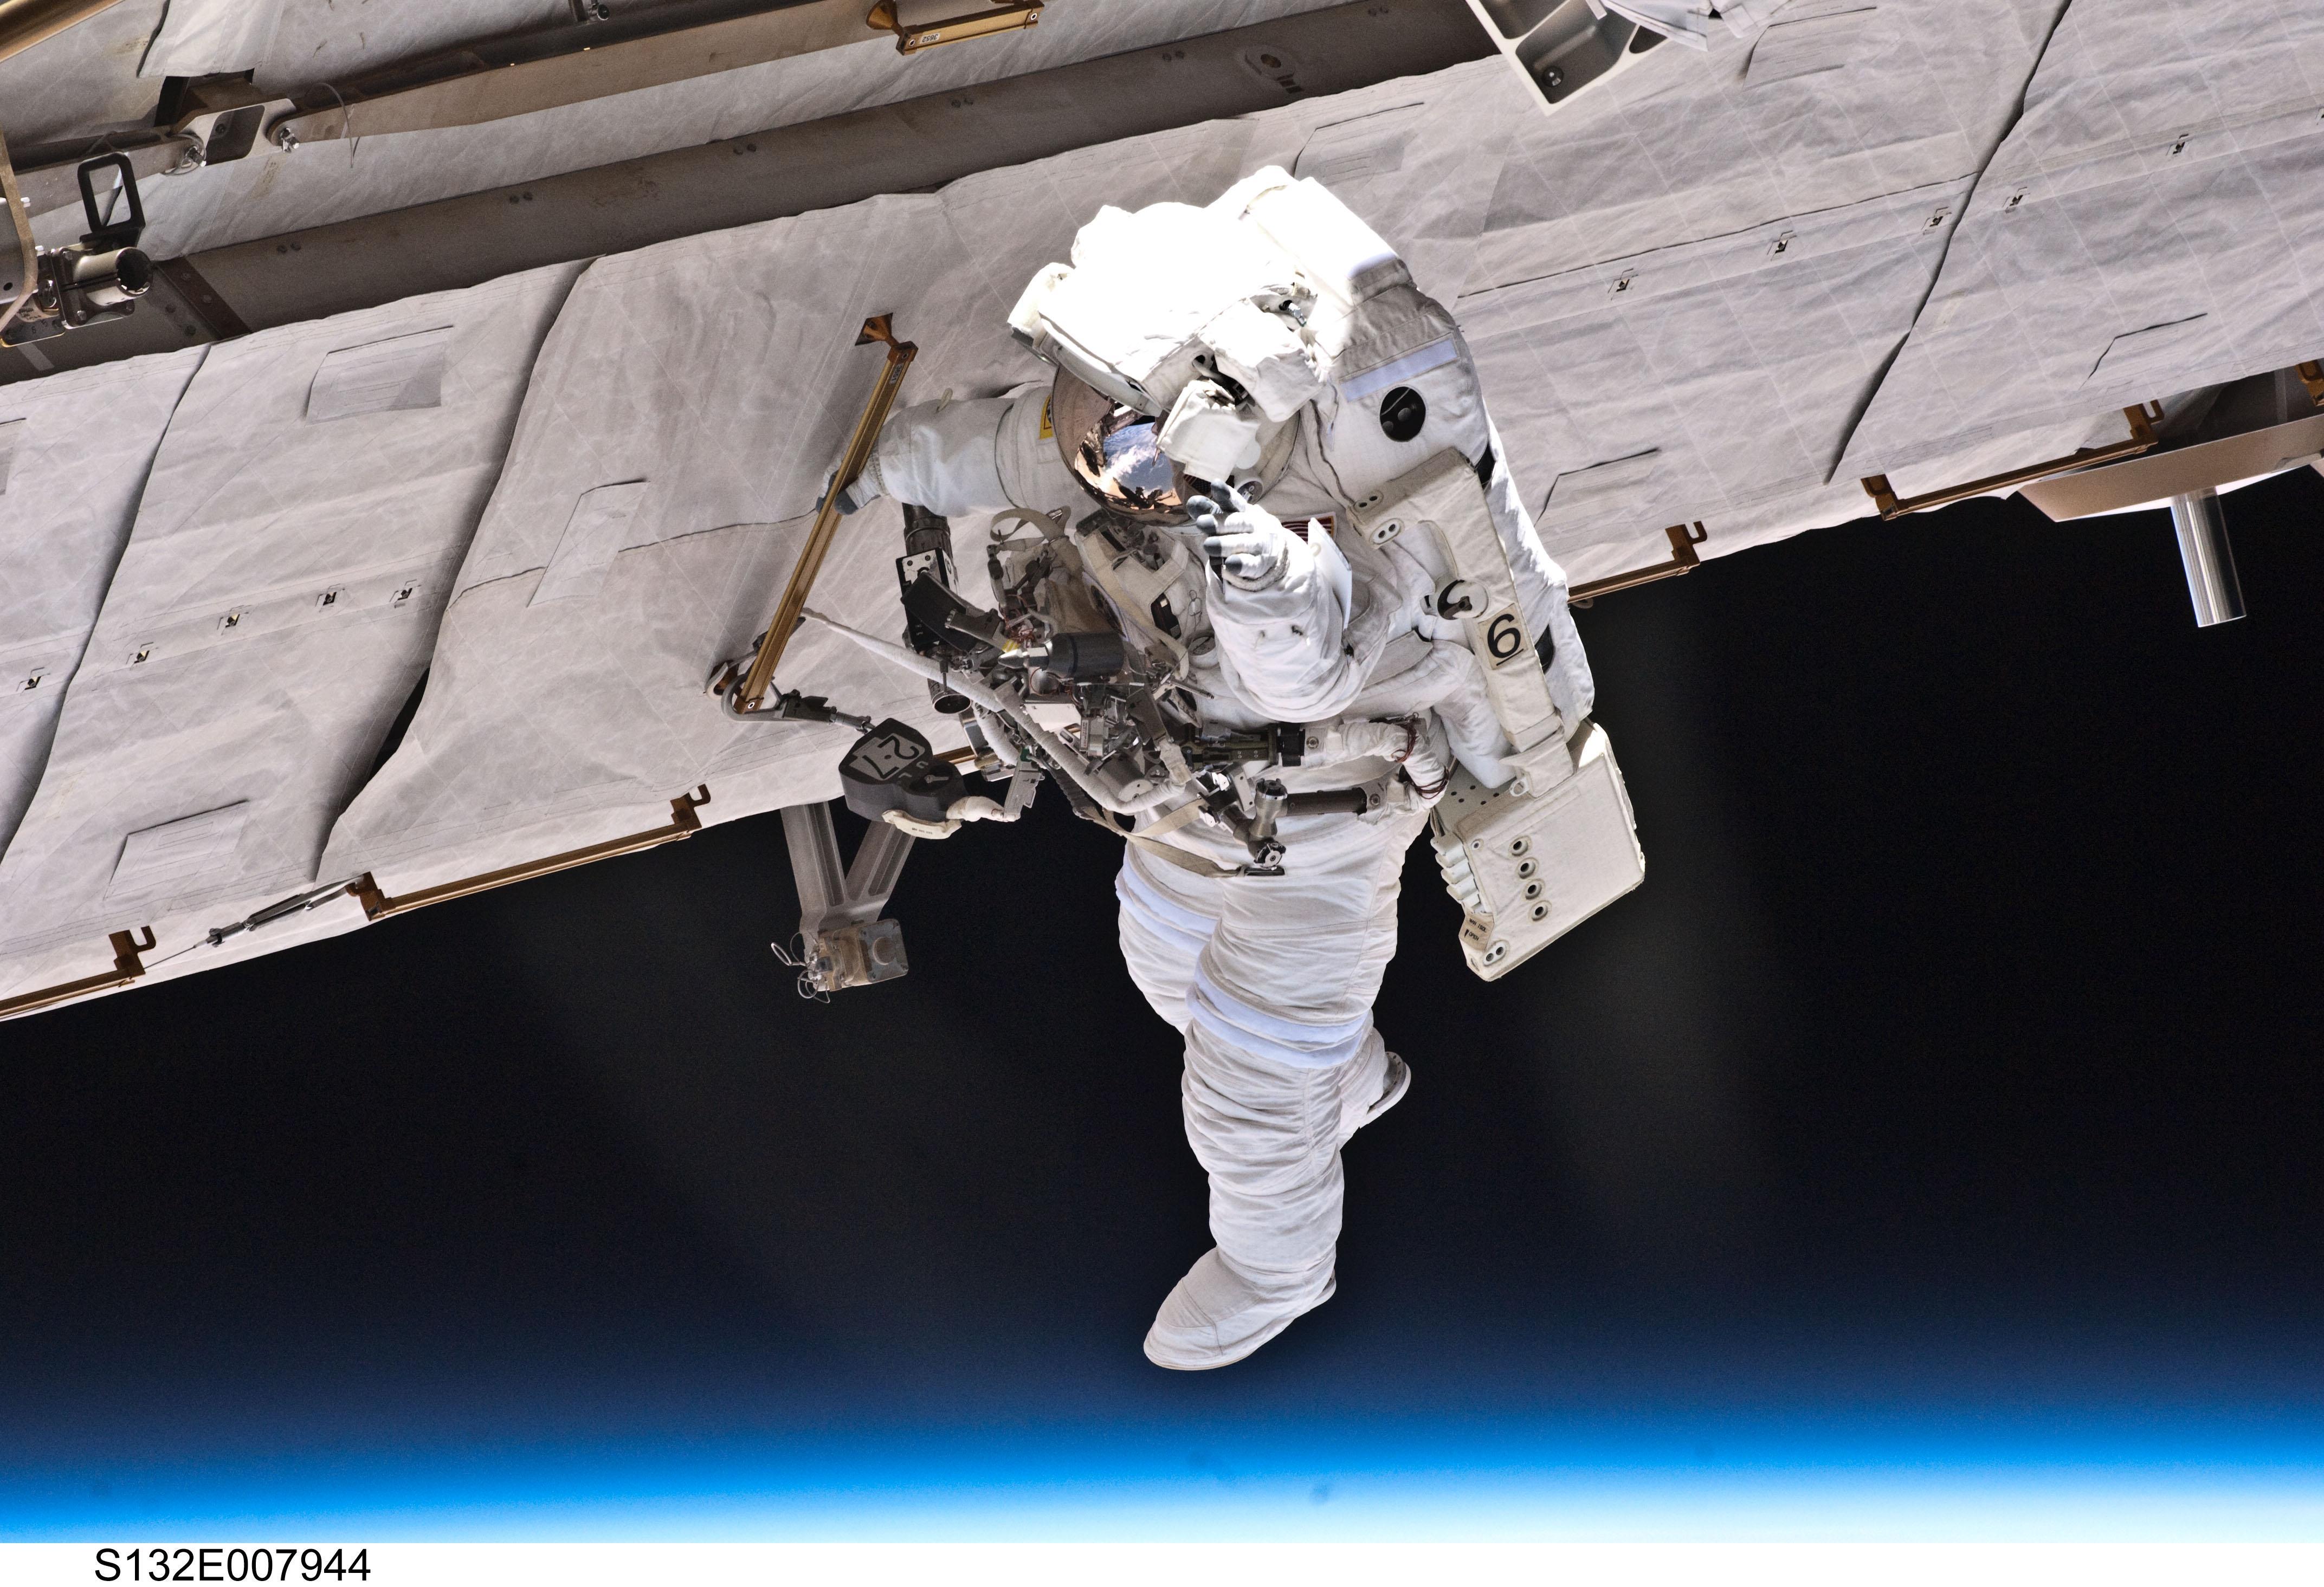 Free NASA Photo: Astronaut Garrett Reisman on a Space Walk.